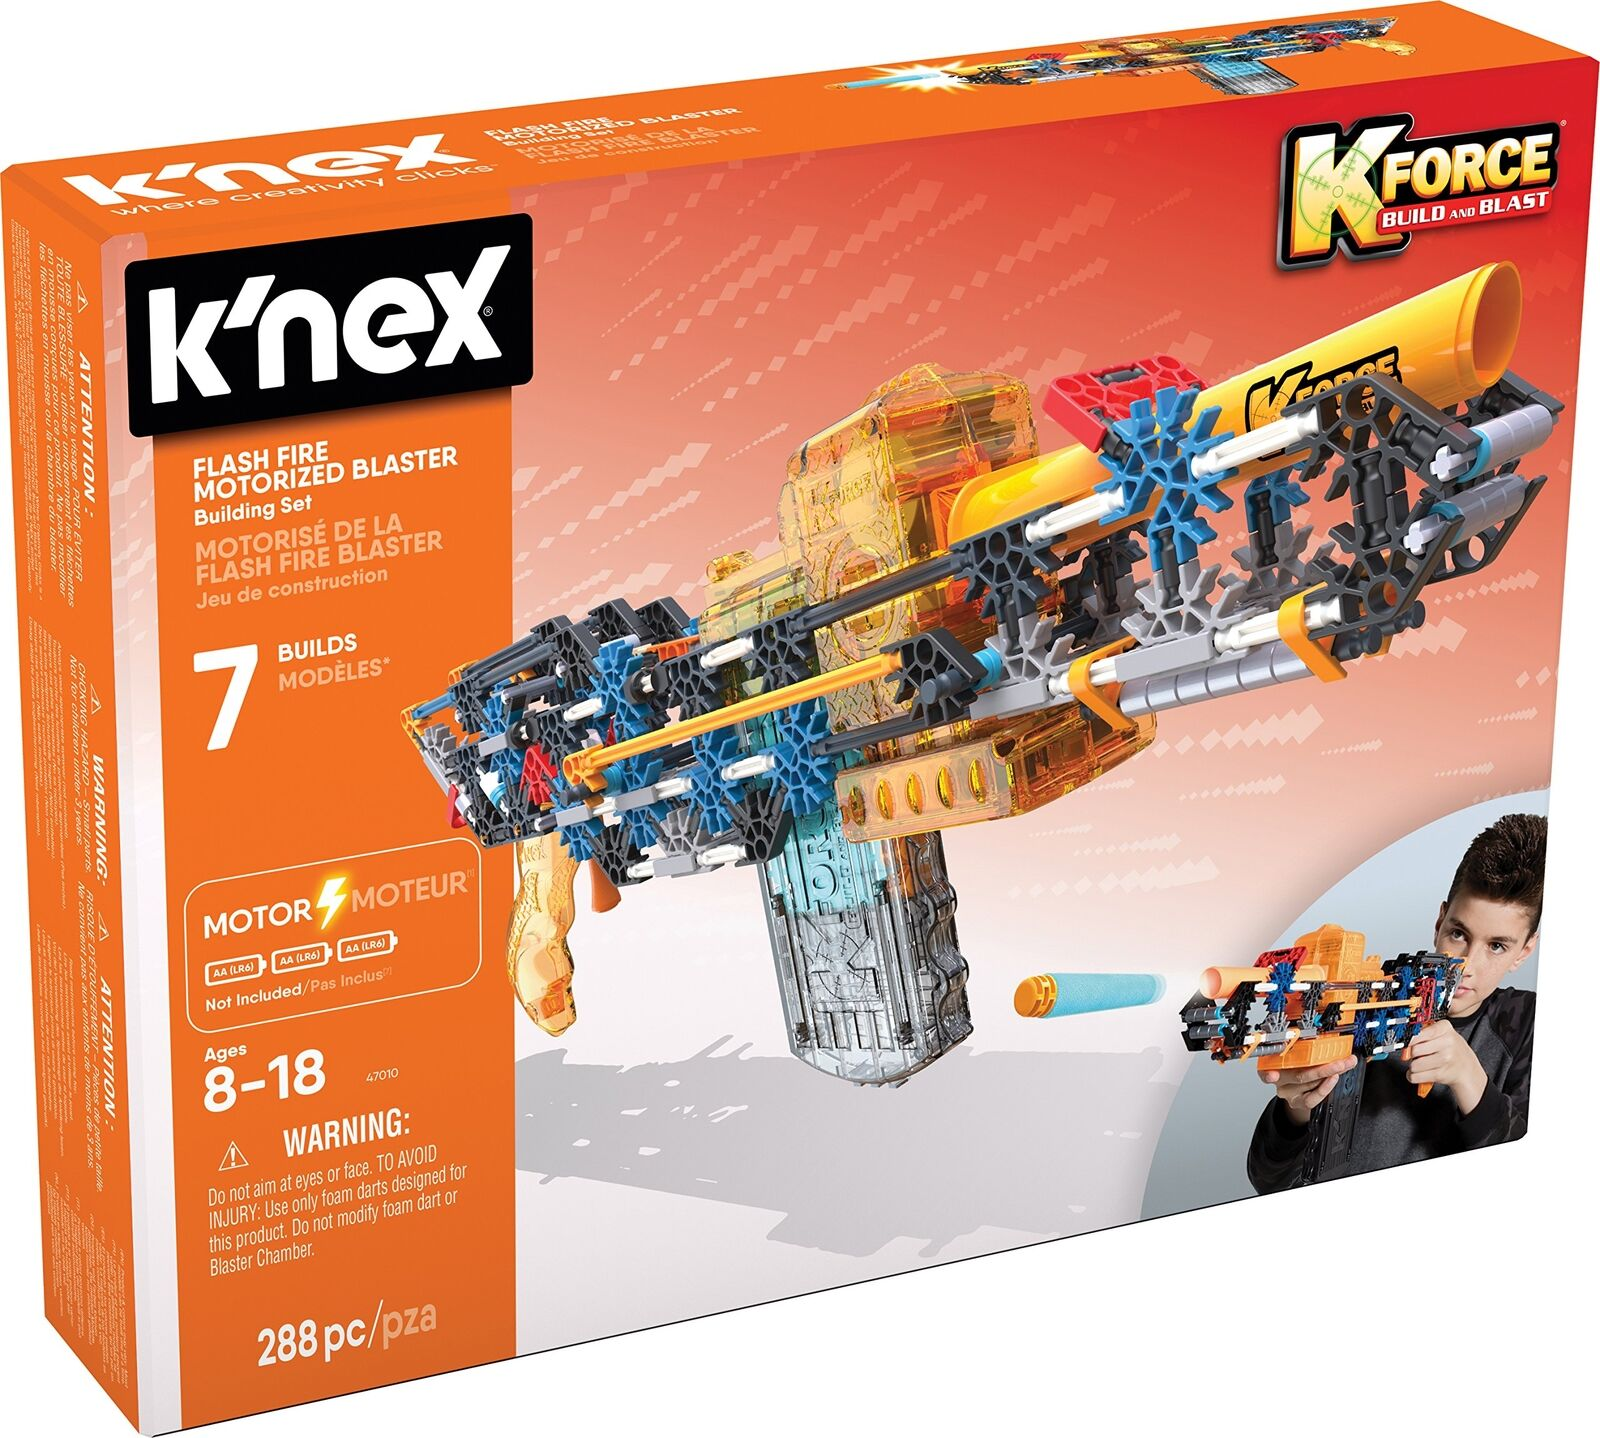 K'NEX K-Force Flash Fire Motorised Blaster Building Set for Ages 8+ Engineering